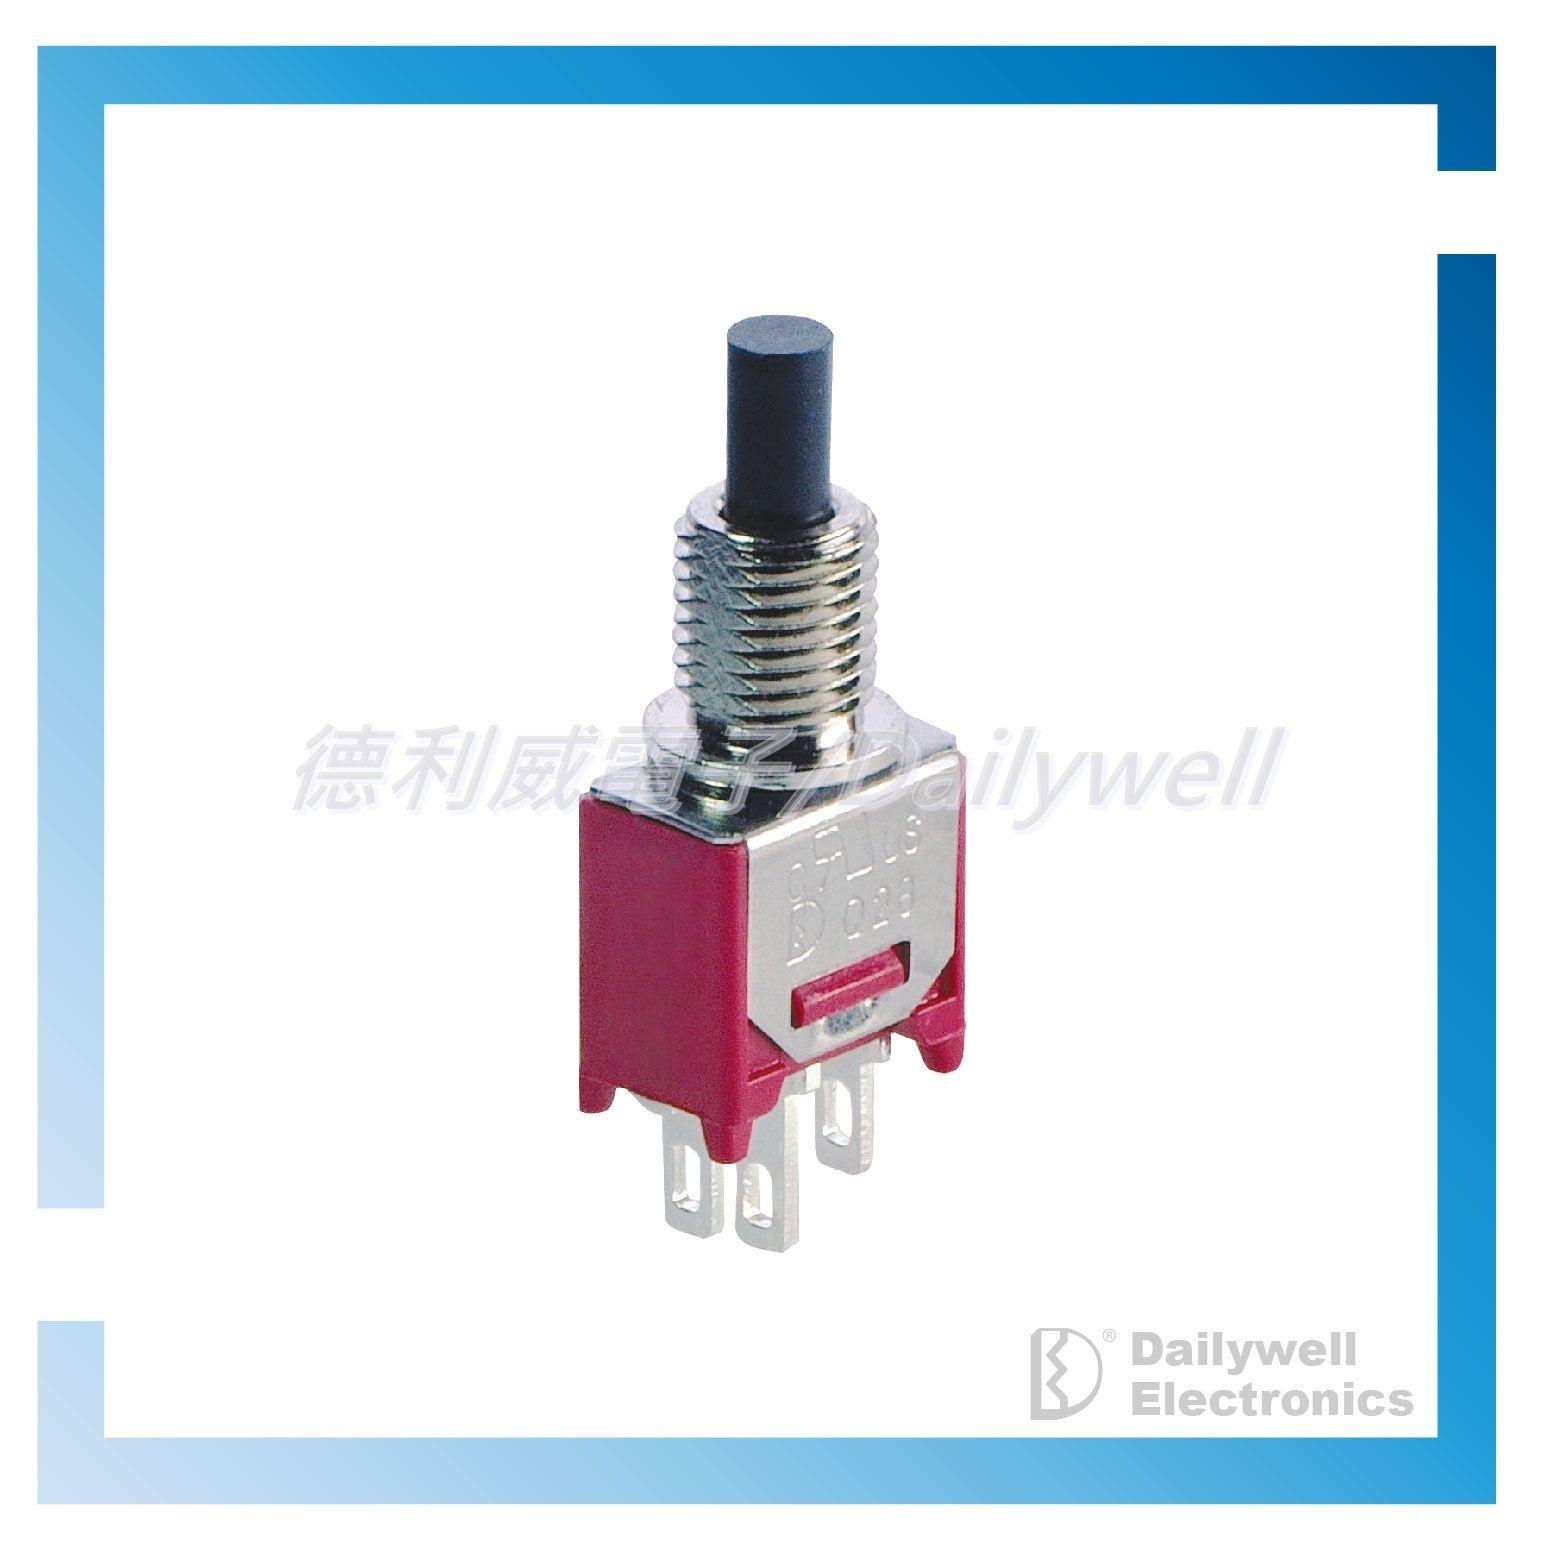 Sub-Miniature Pushbutton Switches